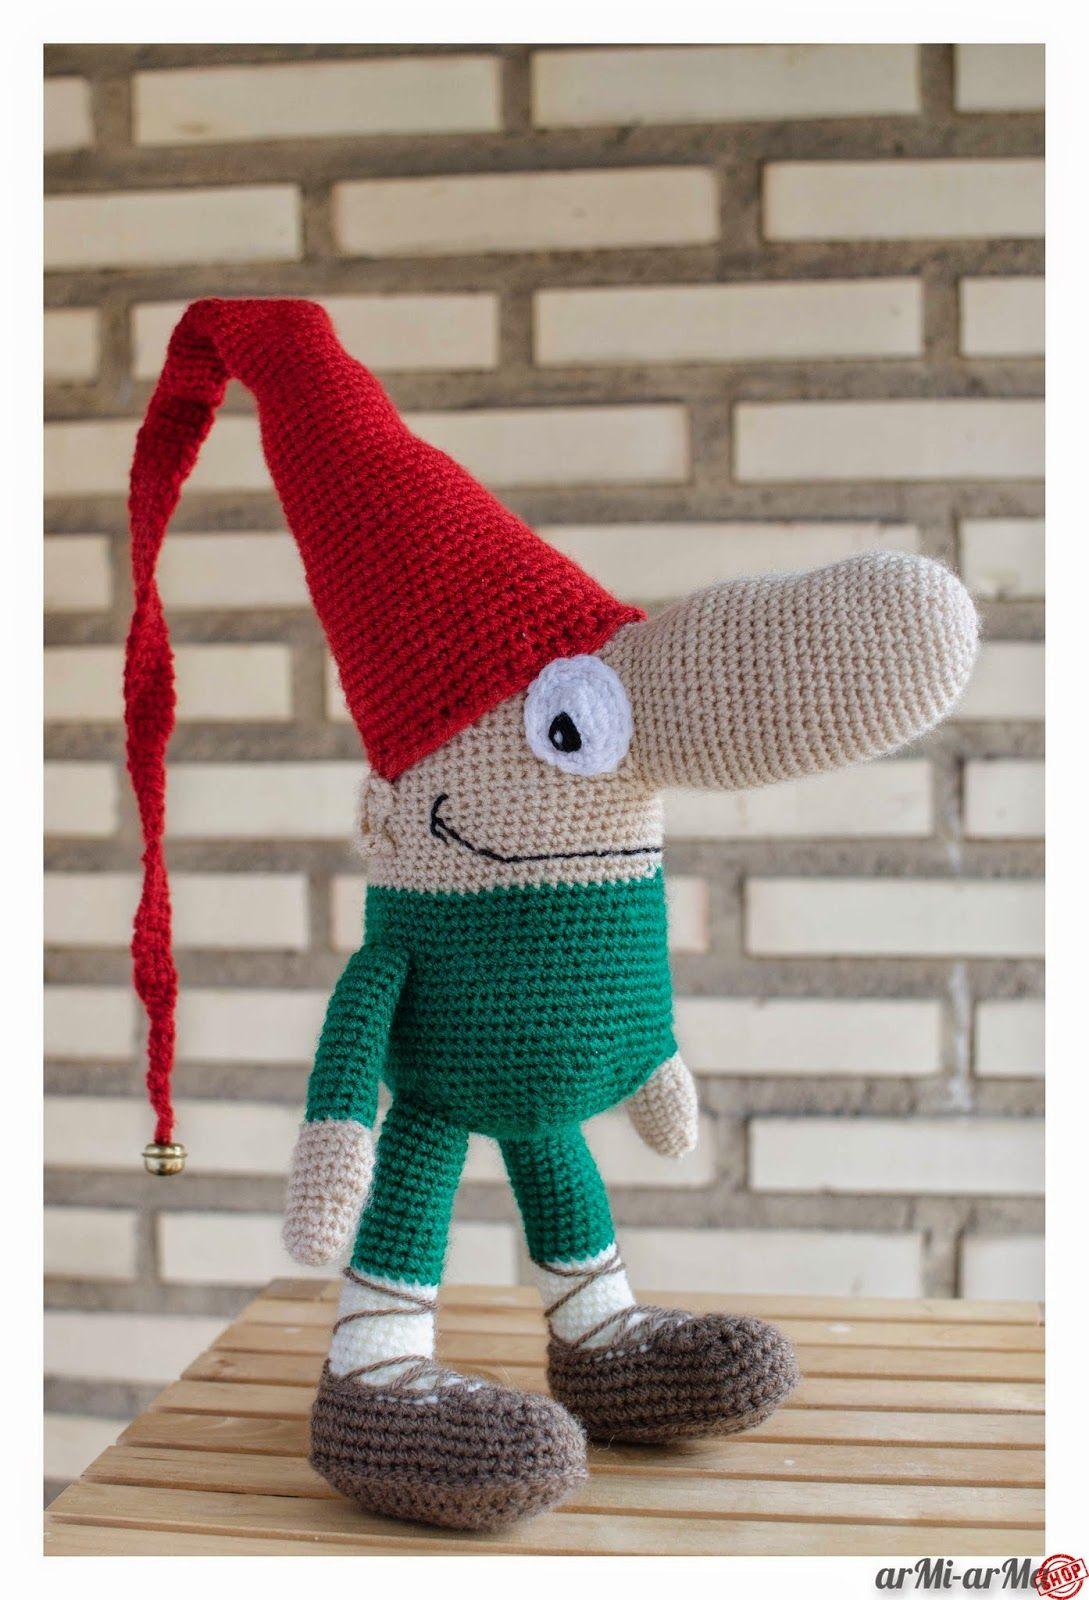 Blog sobre crochet, ganchillo, patrones | Proyectos que intentar ...